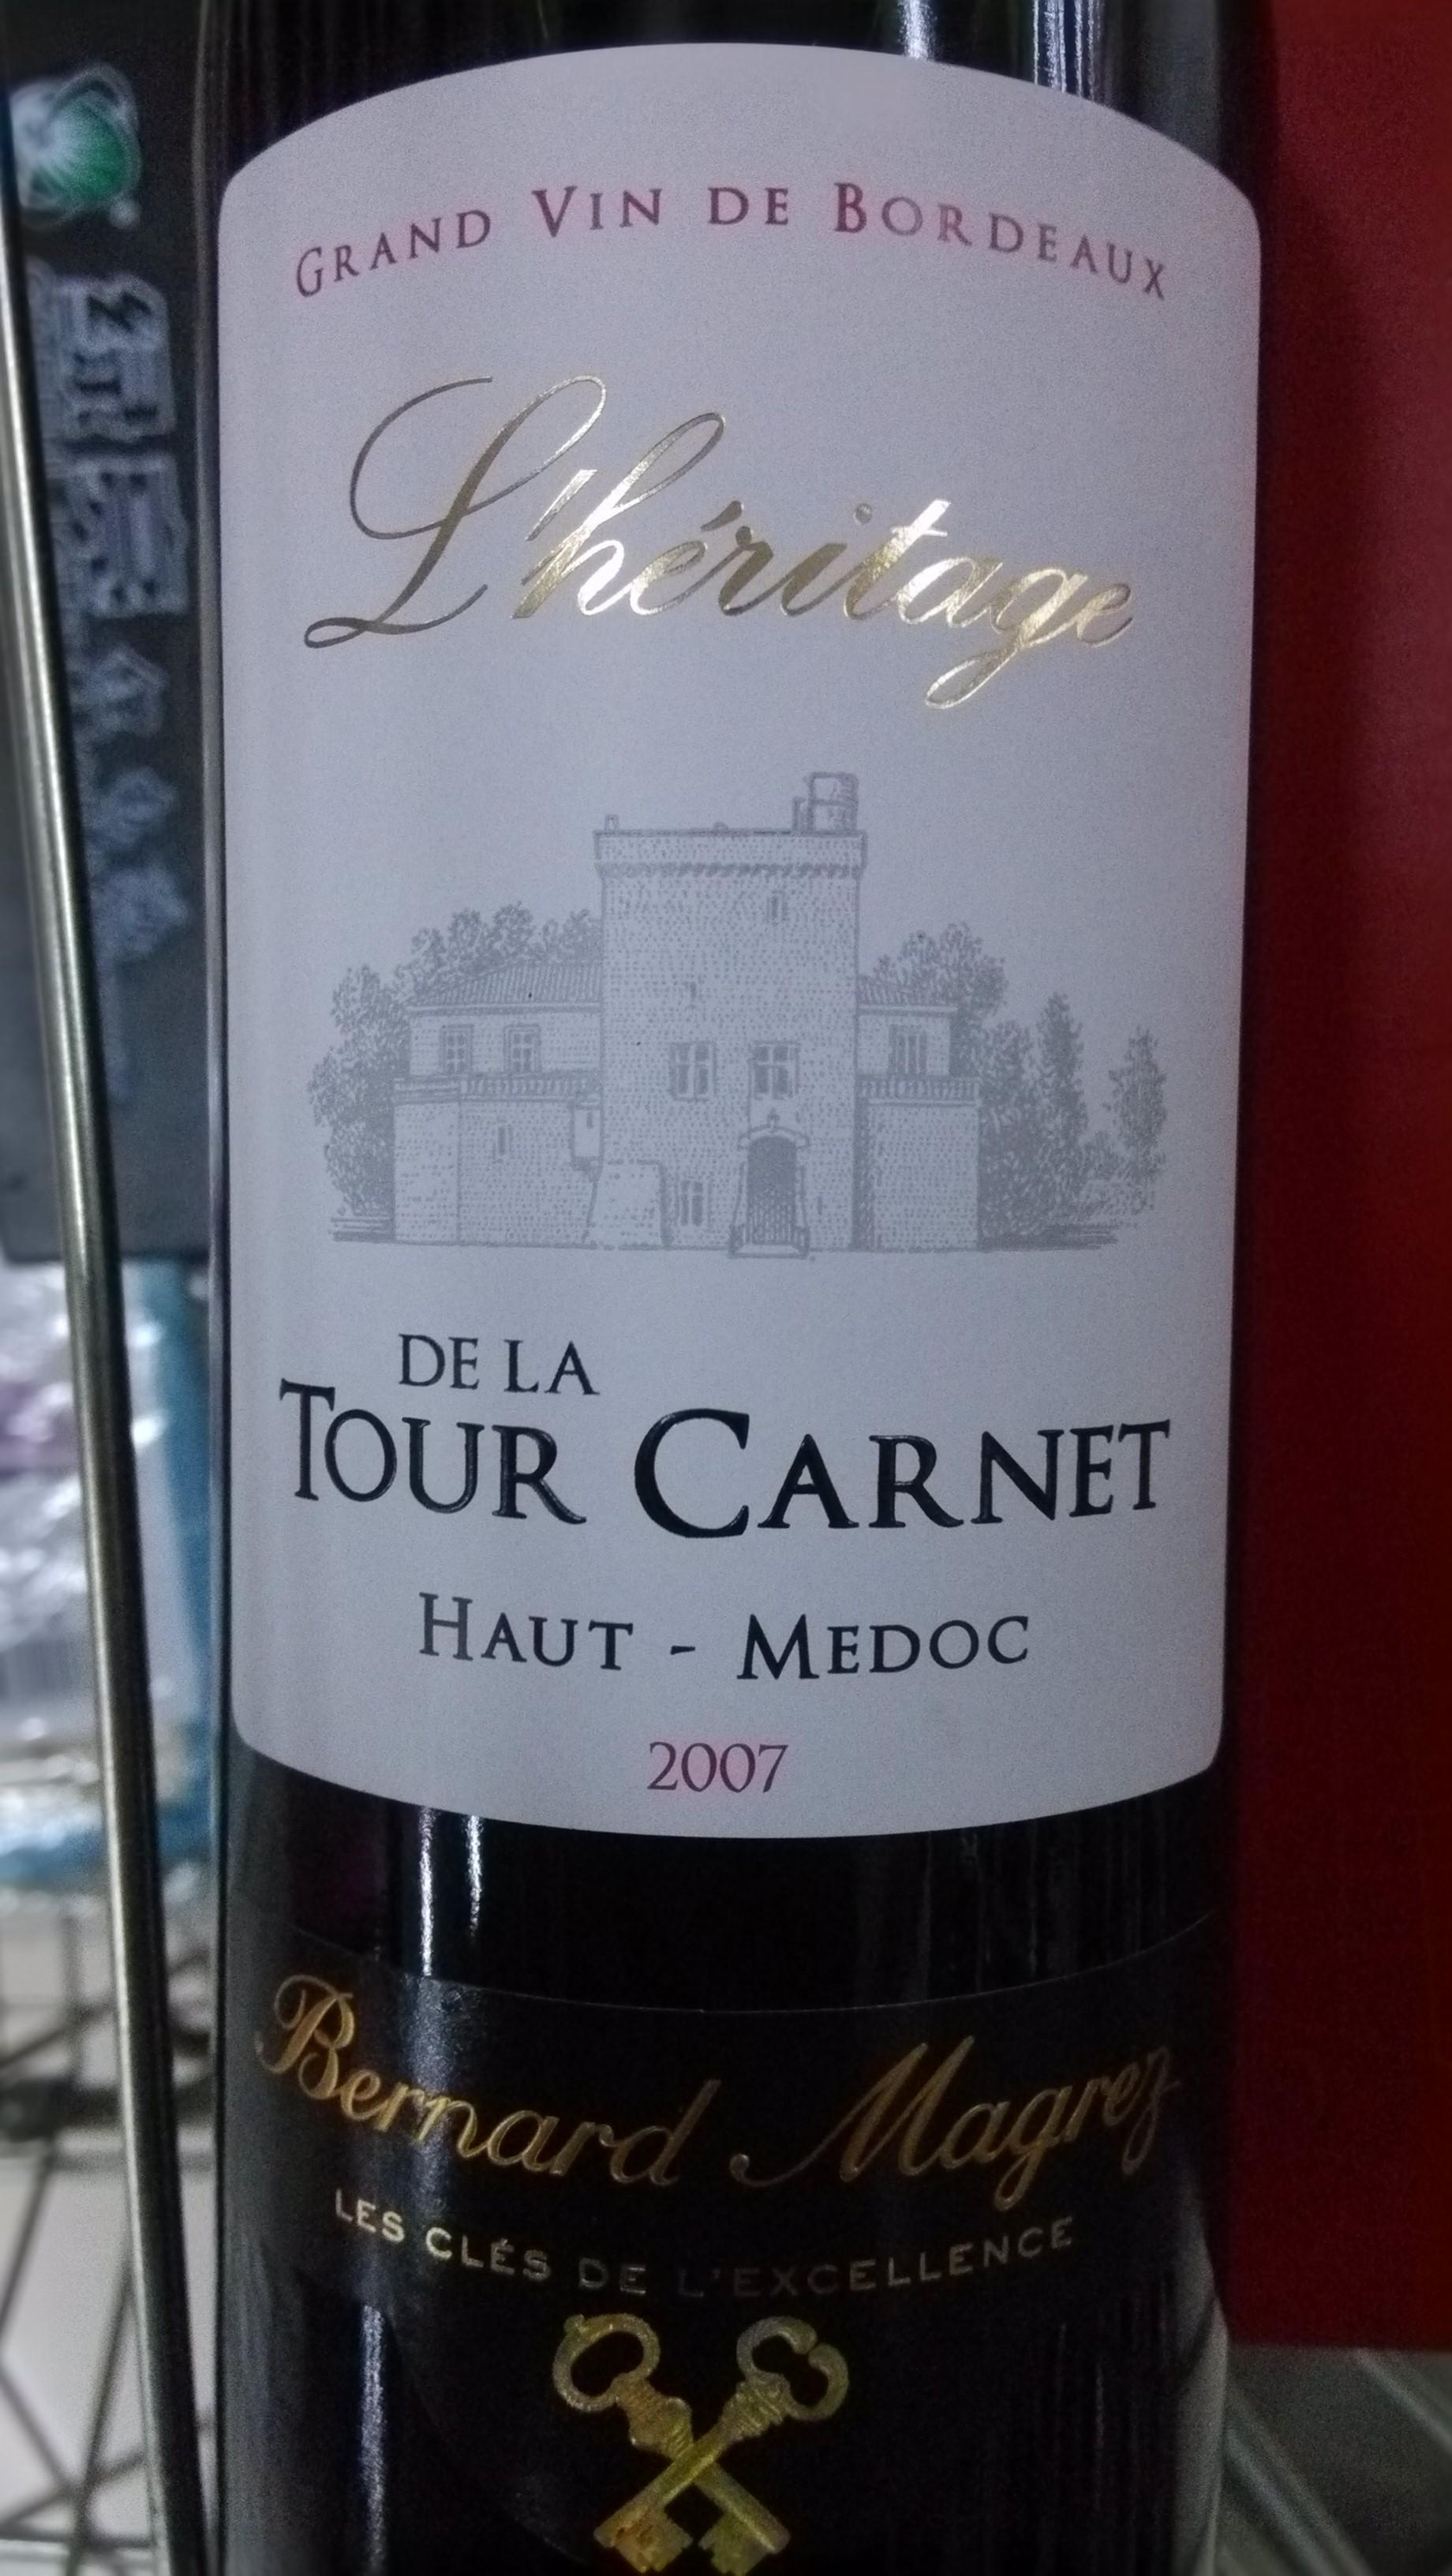 拉图嘉利传承干红 L'Heritage De La Tour Carnet Medoc